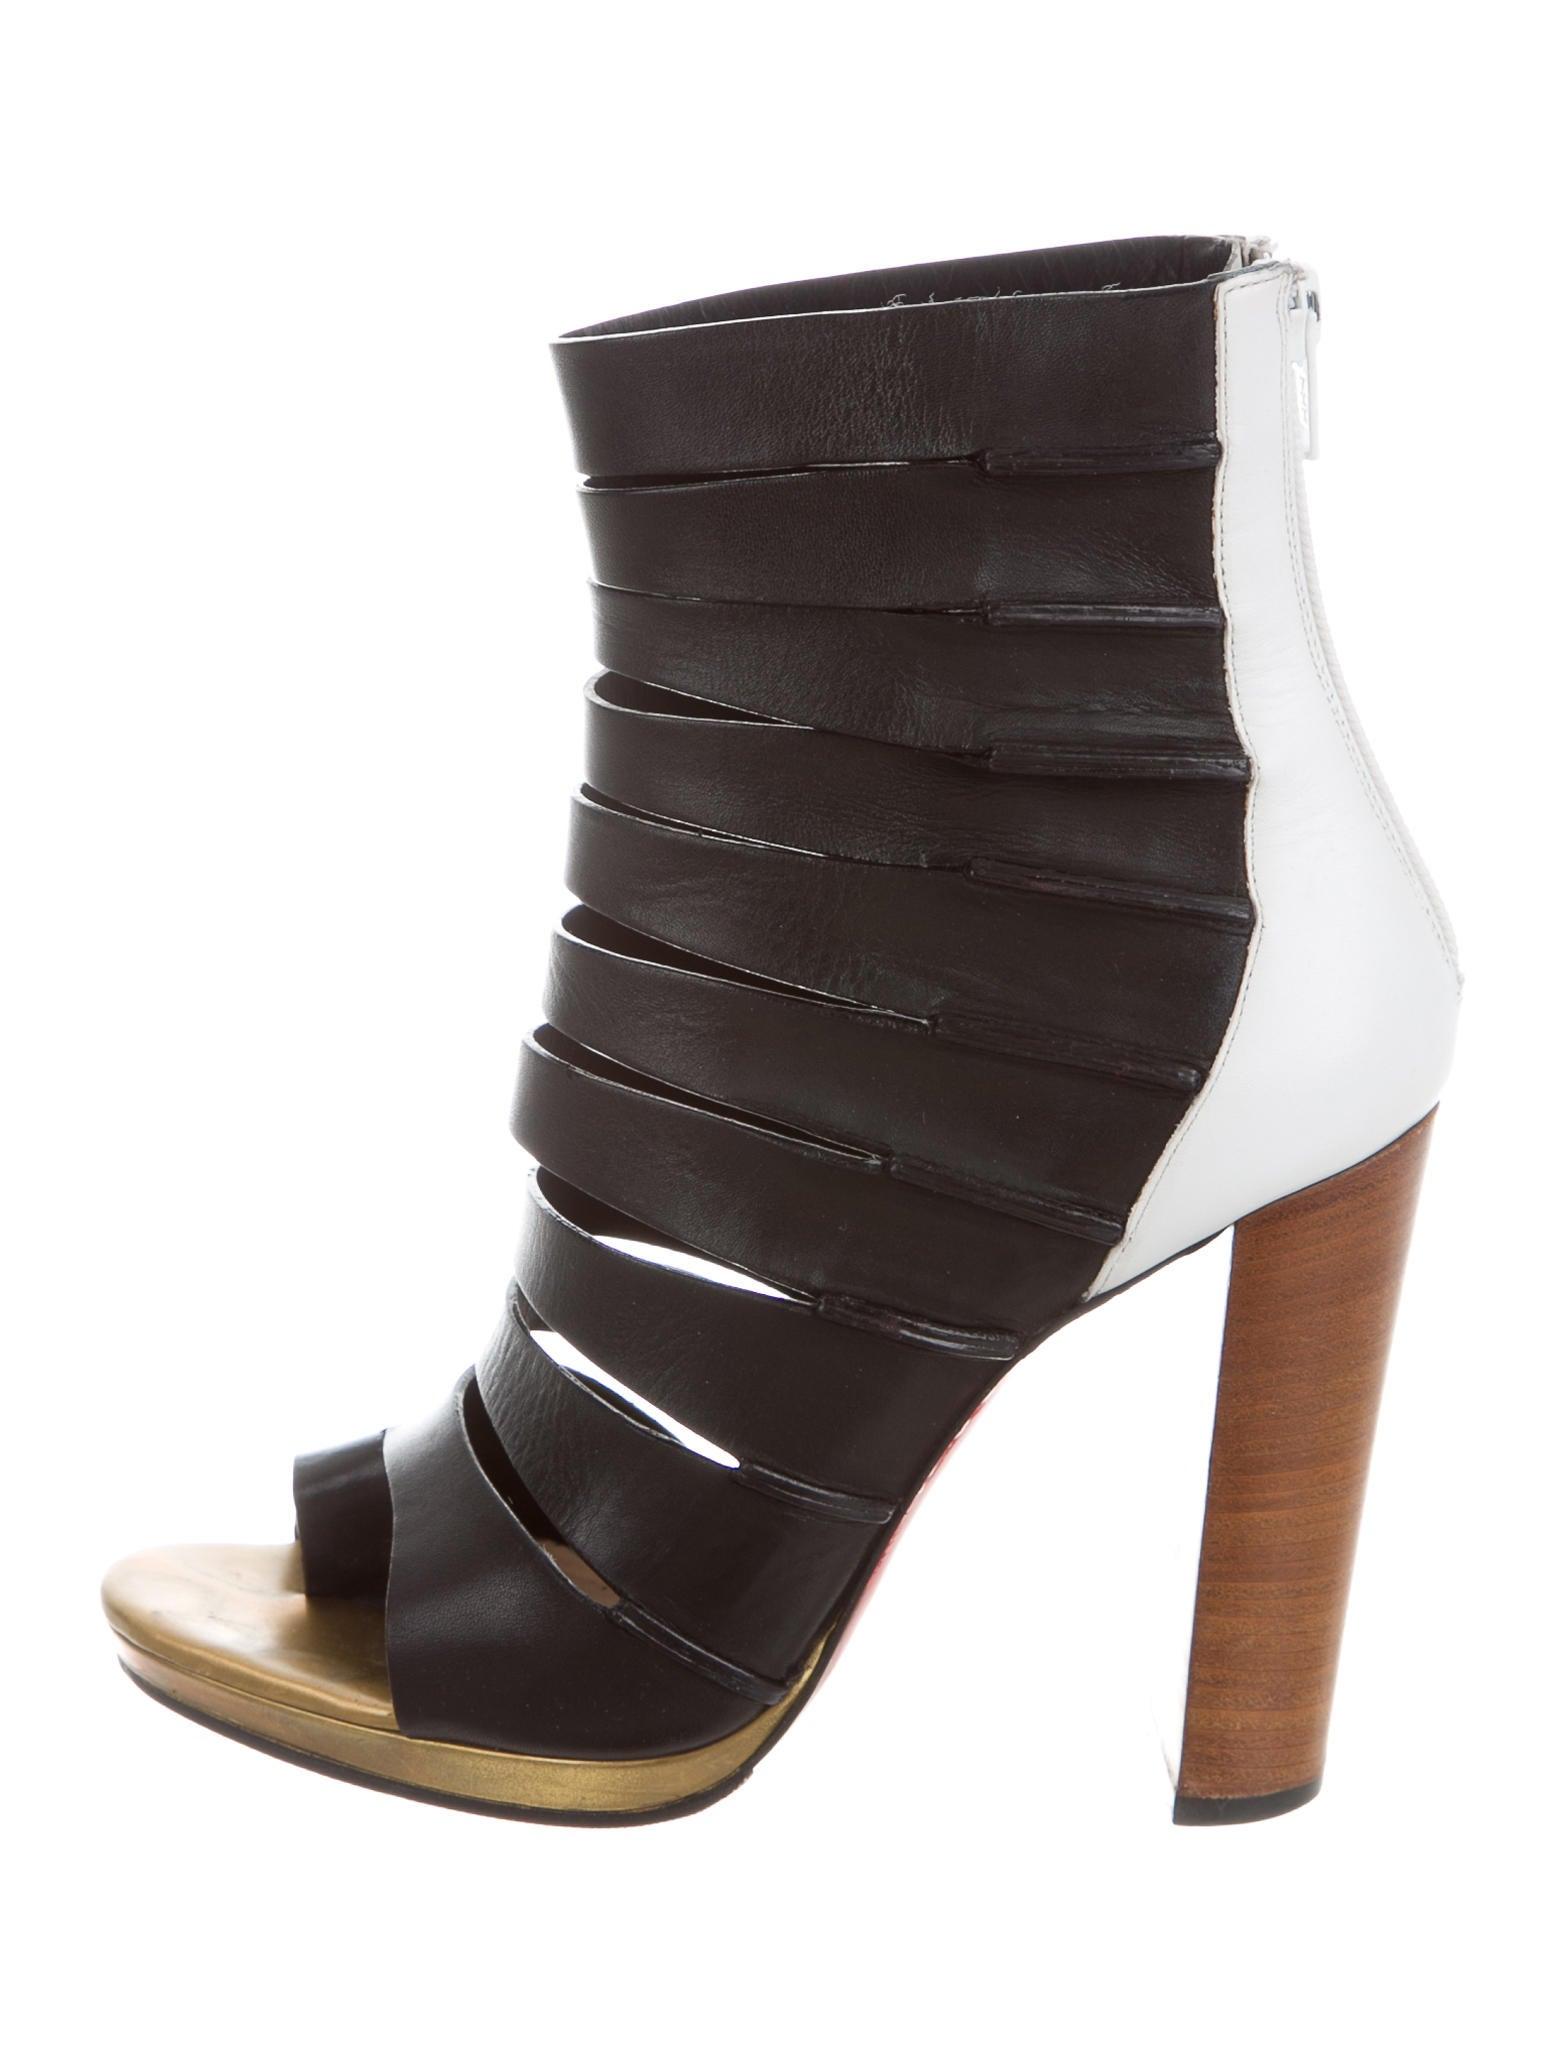 e0efc4002d74 Christian Louboutin Banana 140 Dark Green High Heels